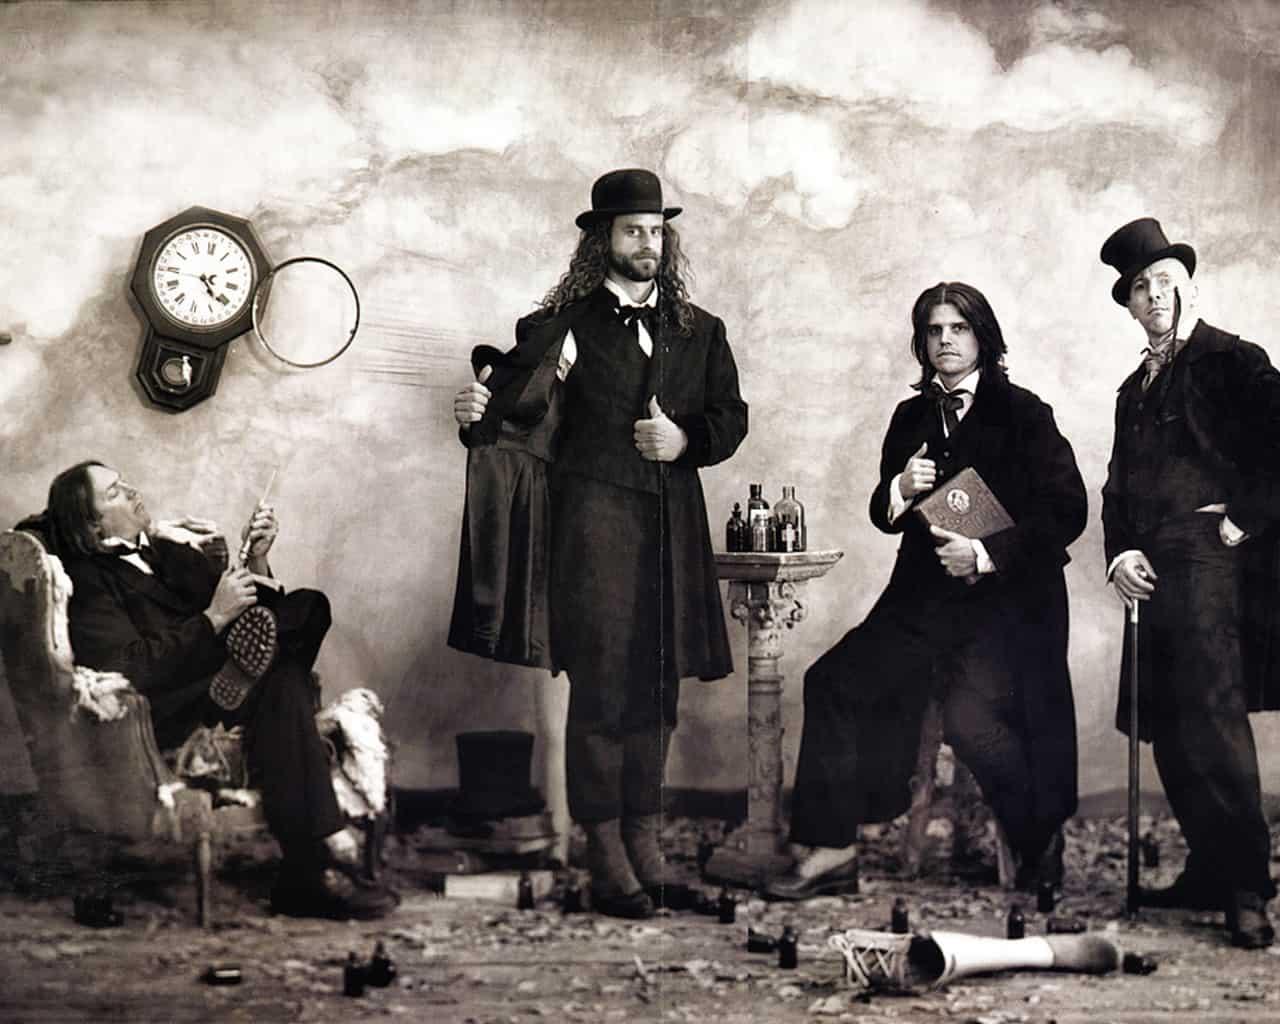 Tool – 90's band